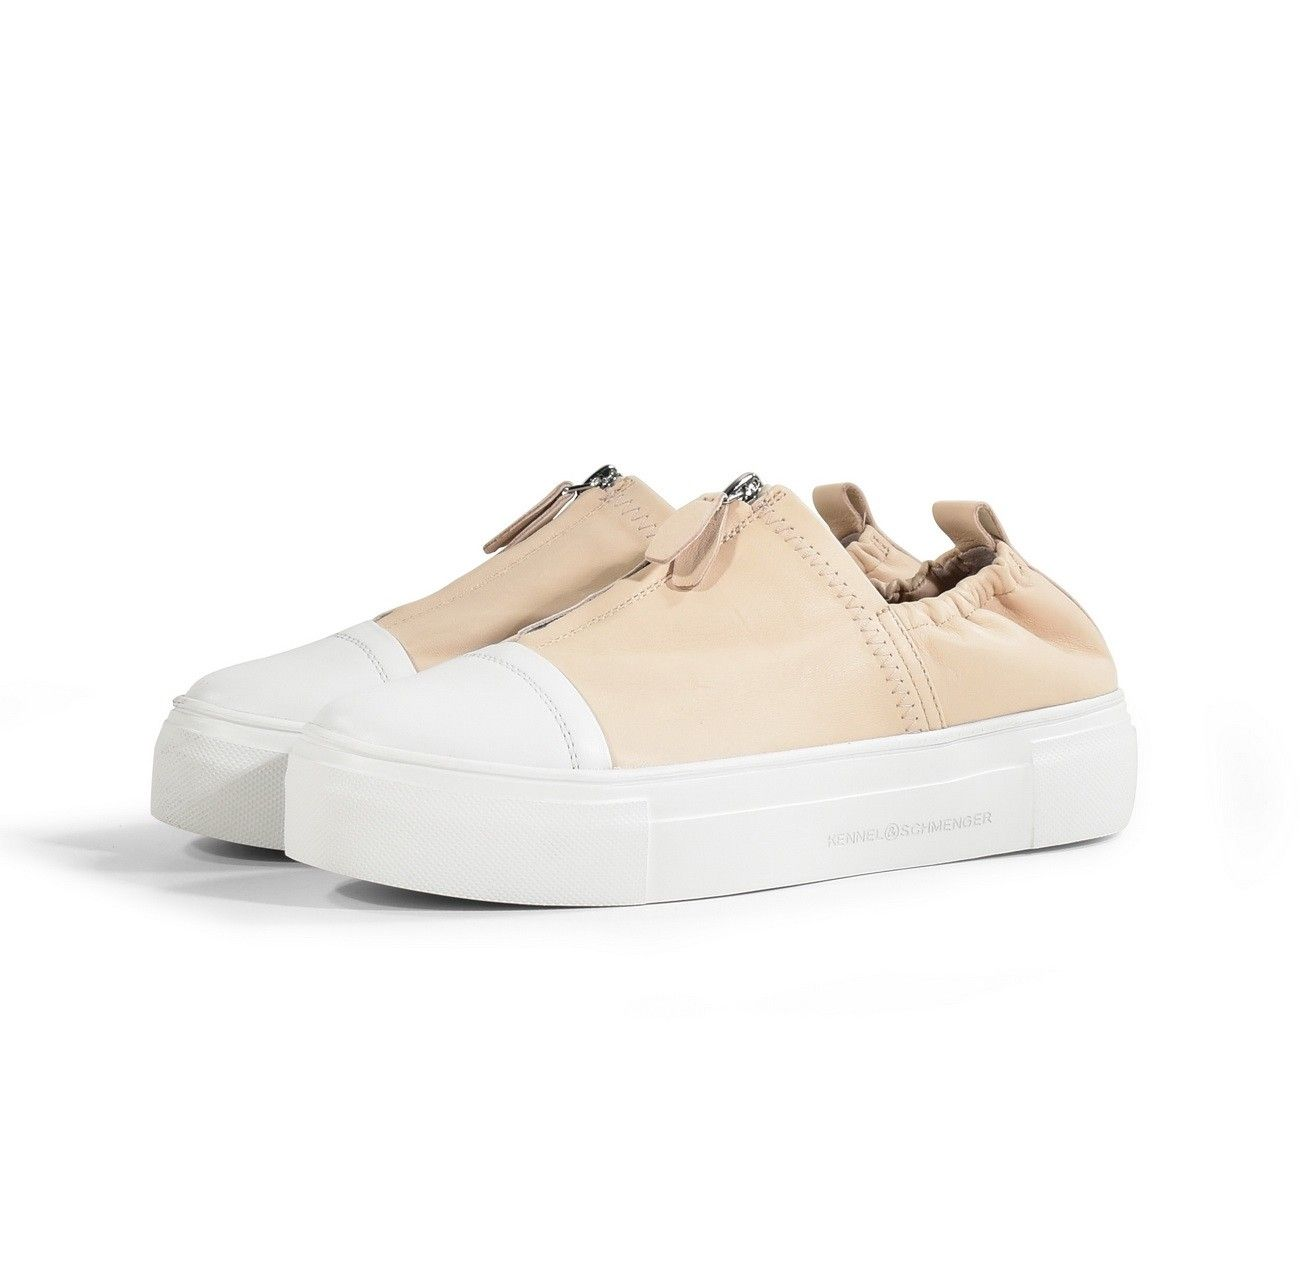 KENNEL & SCHMENGER - Damen Sneaker - Caf/Nappa-S - Bianco/Nudo